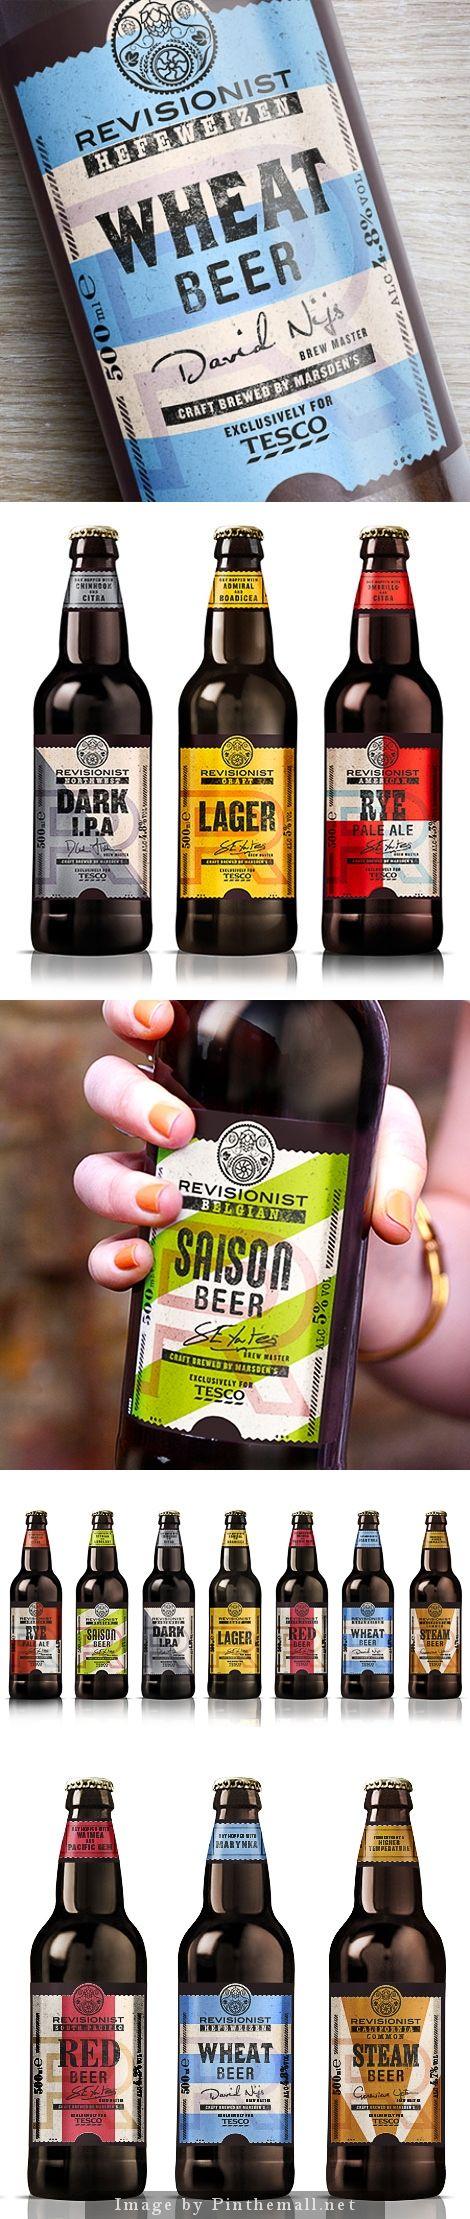 #beer #packaging #design #label